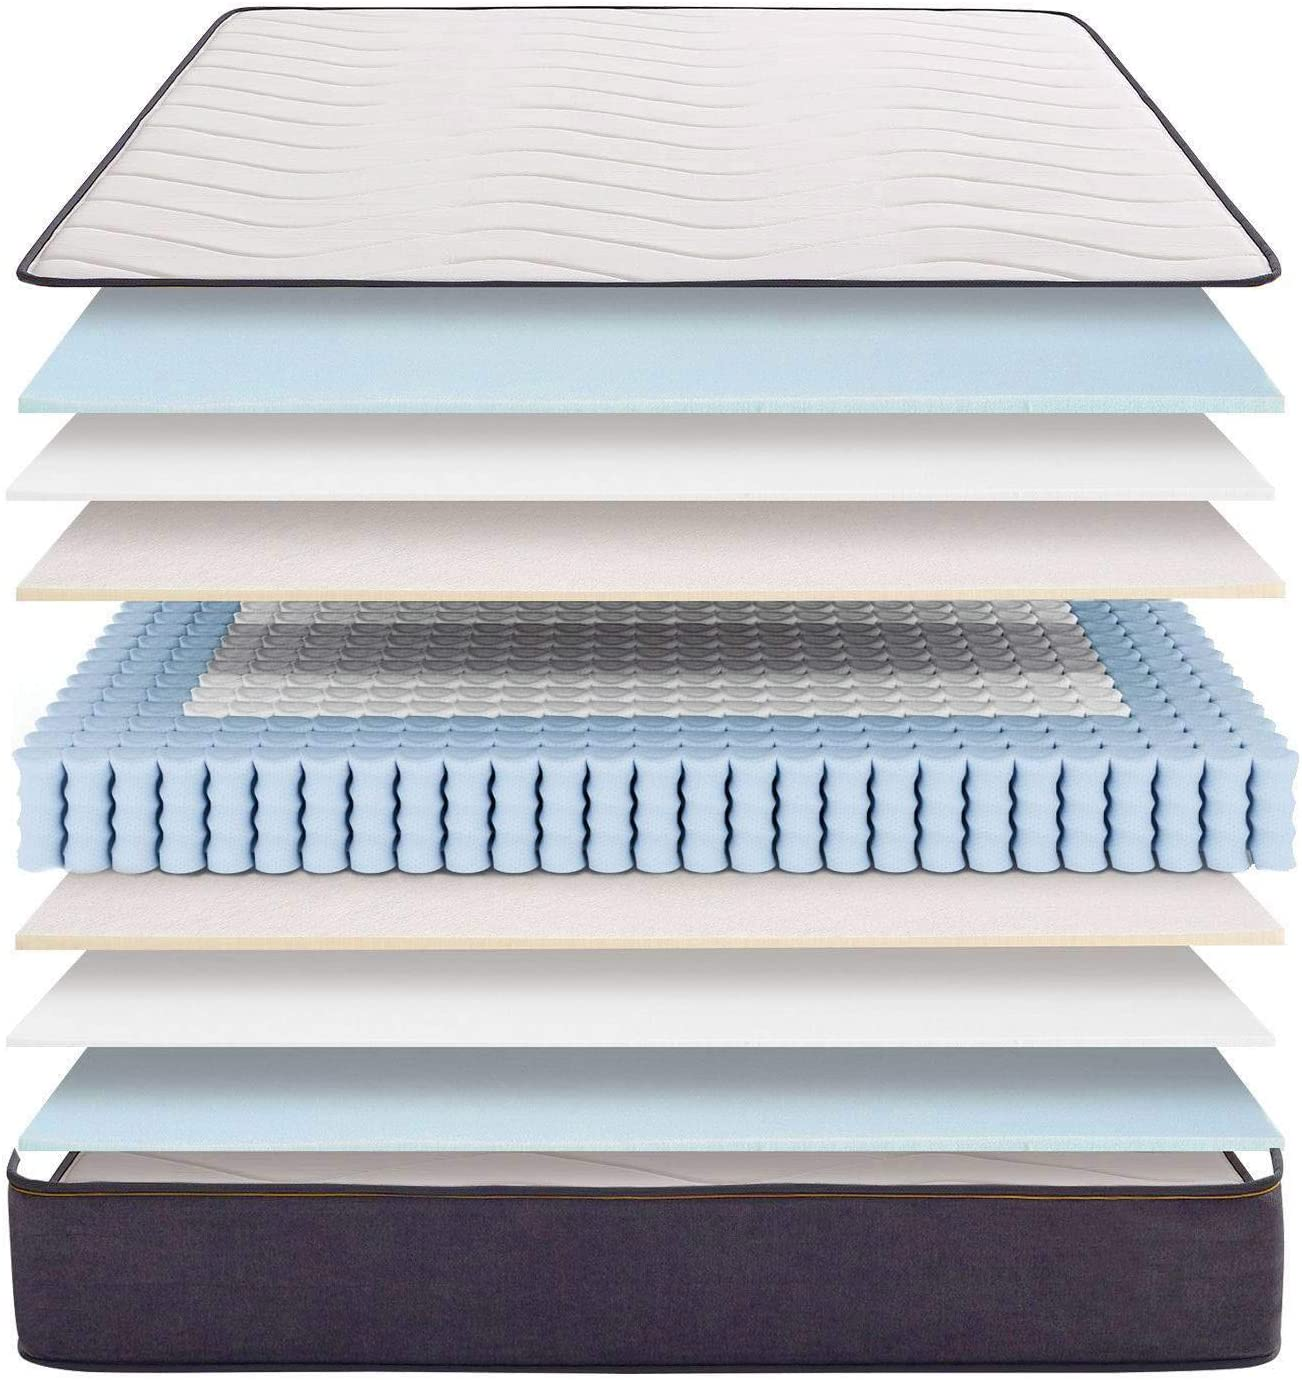 KHAMA Modelo Essential Basic | Muelles Ensacado con viscoelástica | Firmeza 8/10 | 28% Más Transpirable I Room Lux, 135X190x28